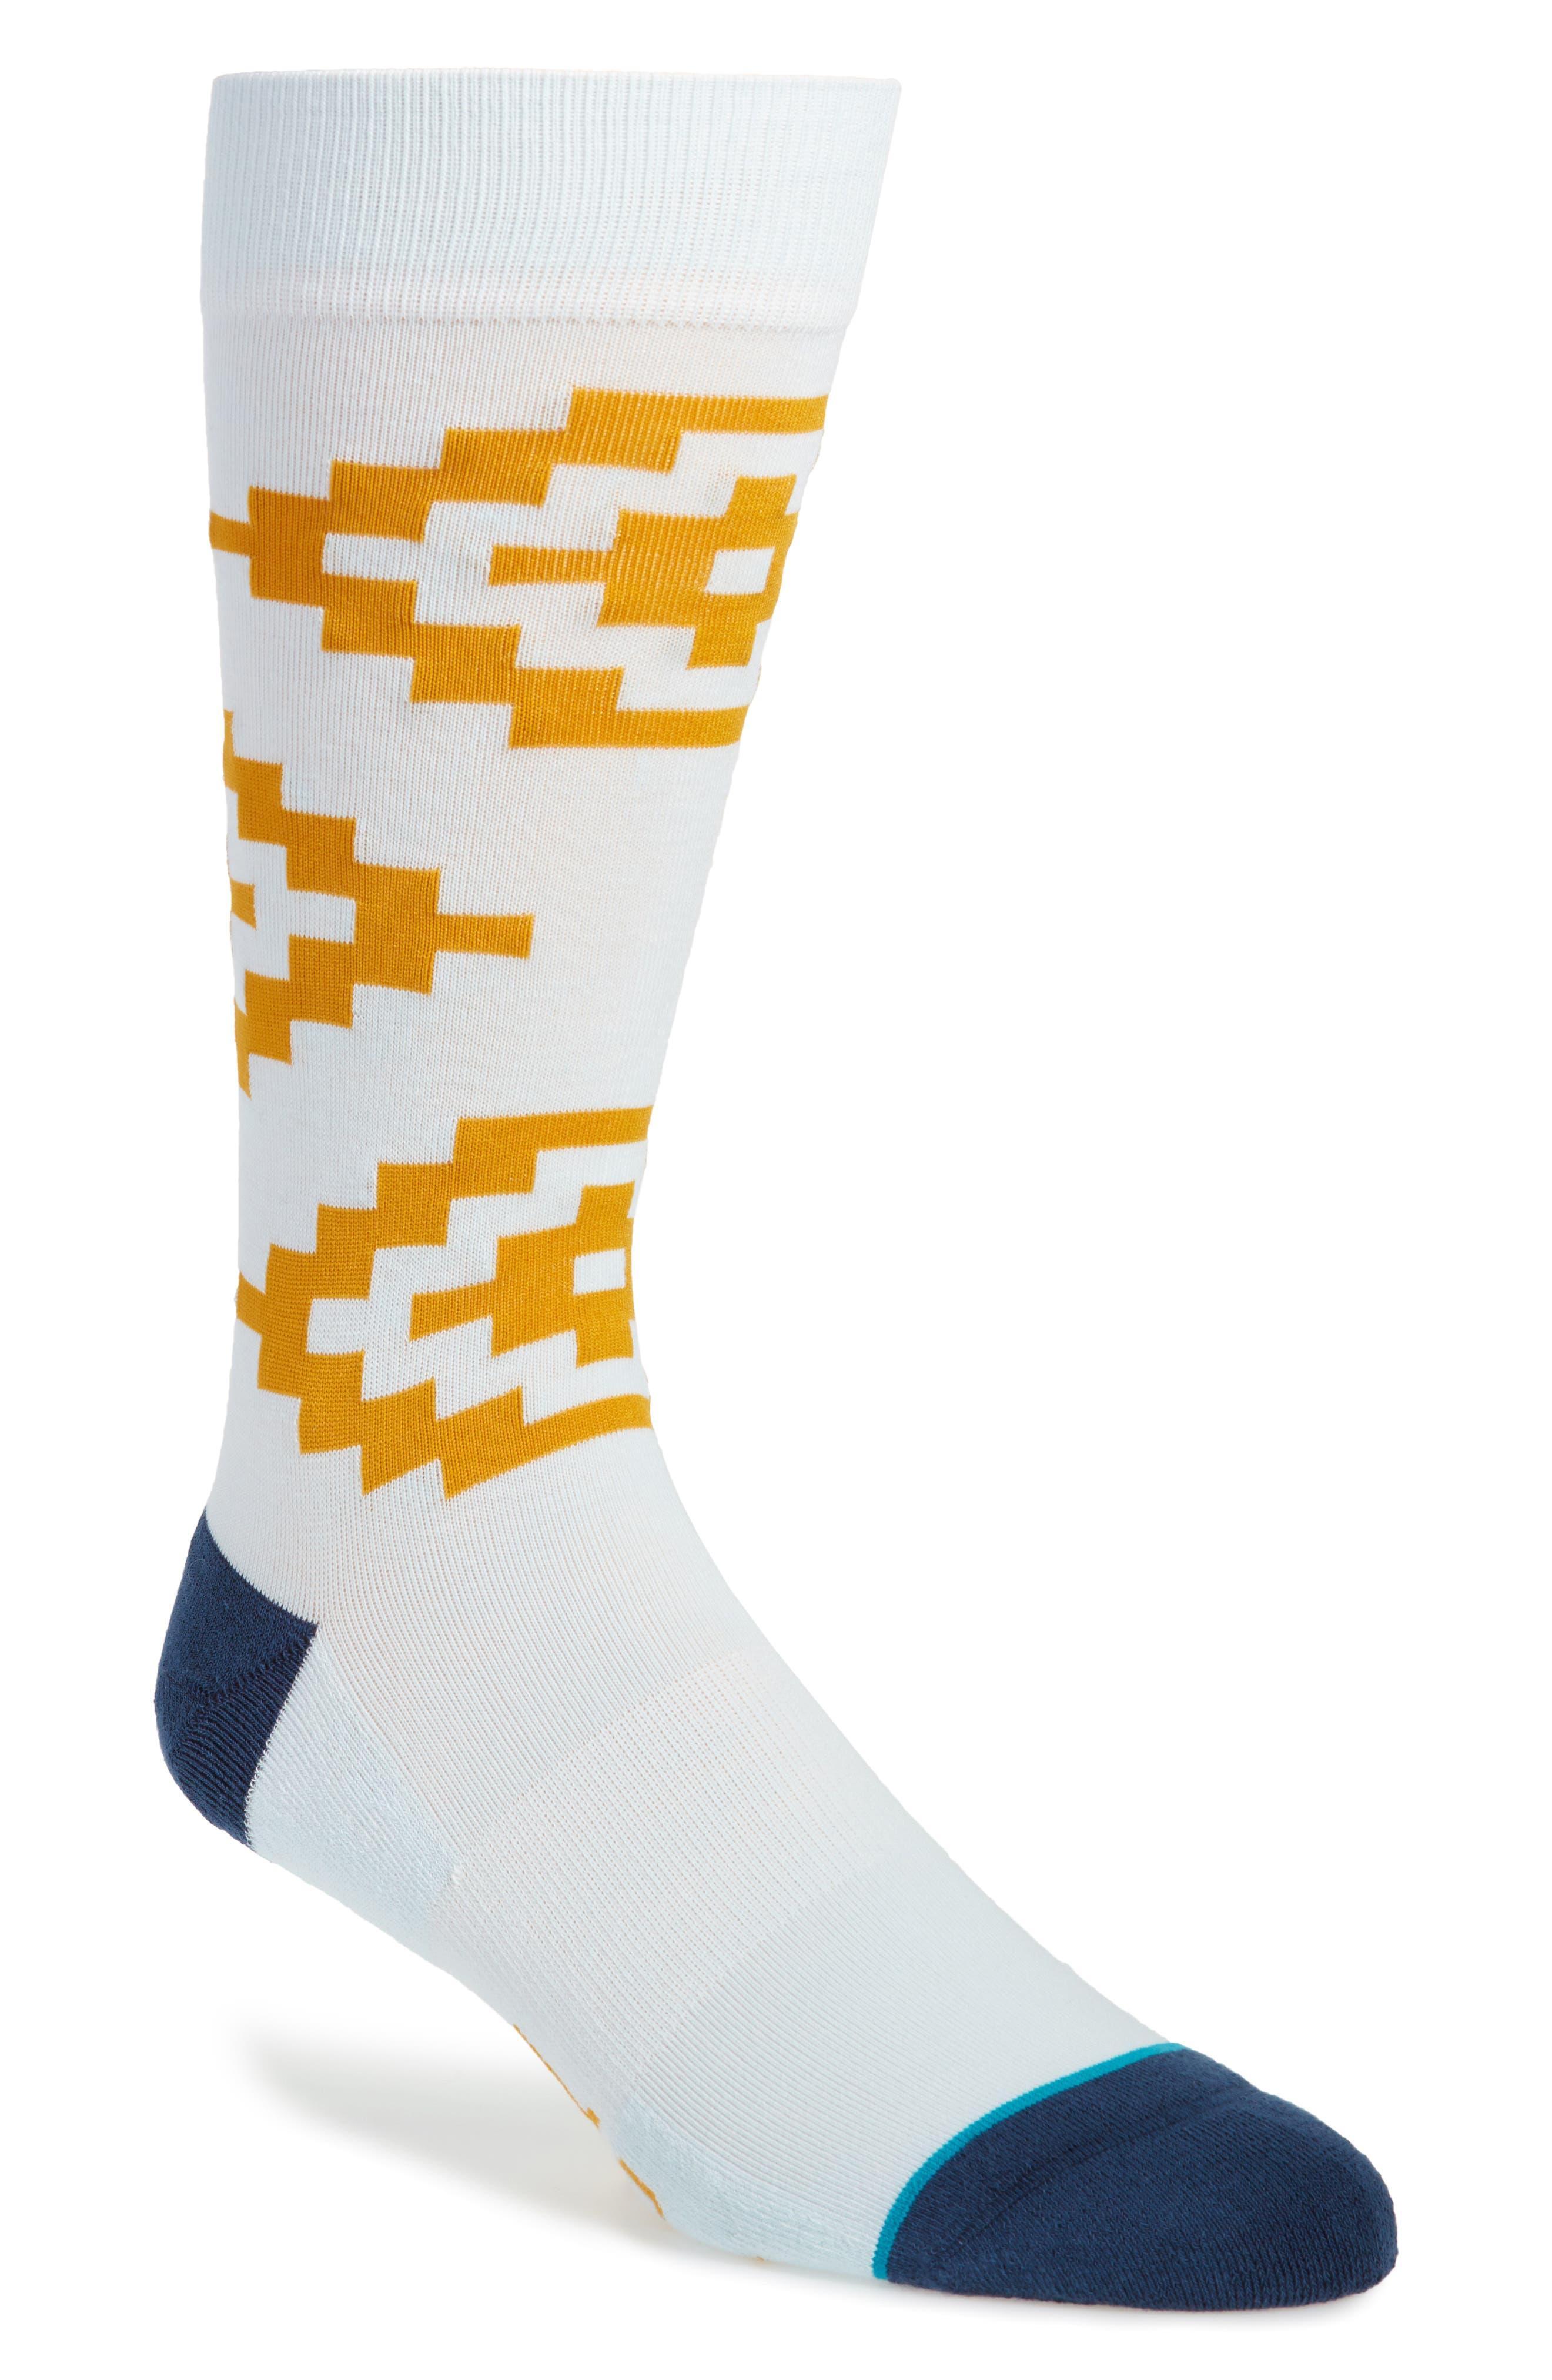 Cairns Crew Socks,                             Main thumbnail 1, color,                             Blue